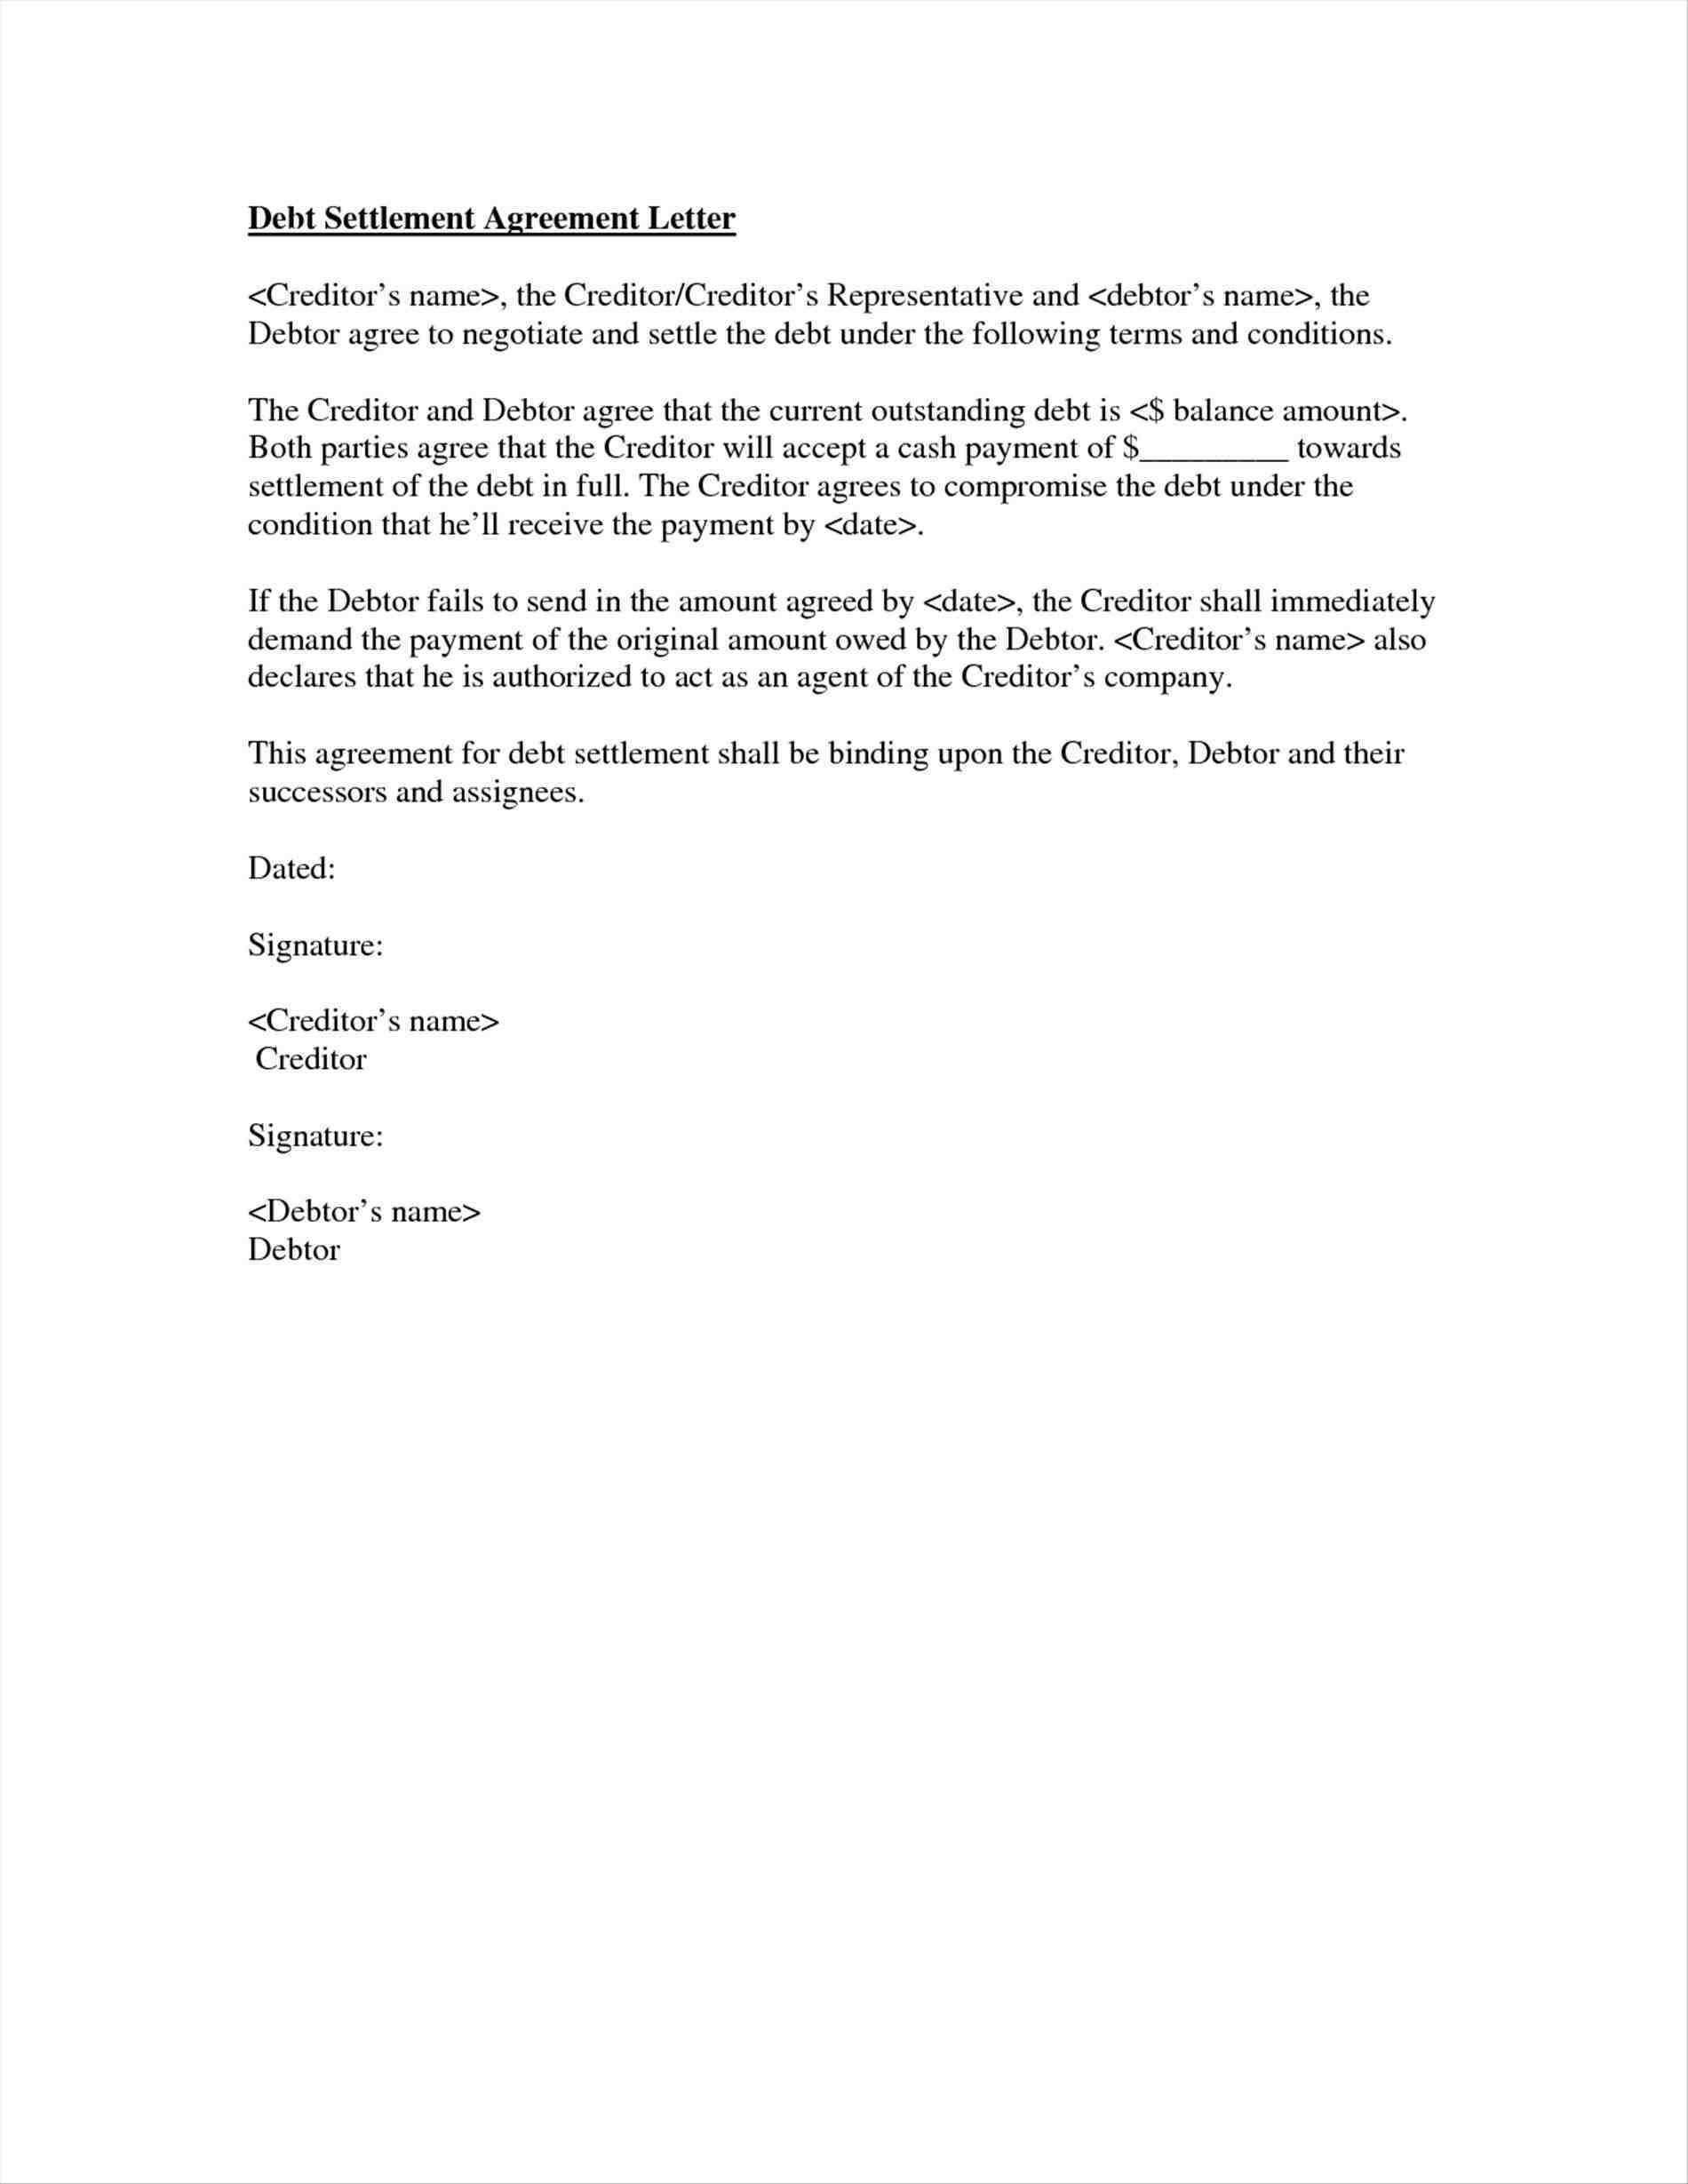 Debt Settlement Agreement Letter Template - Debt Negotiation Letter Template